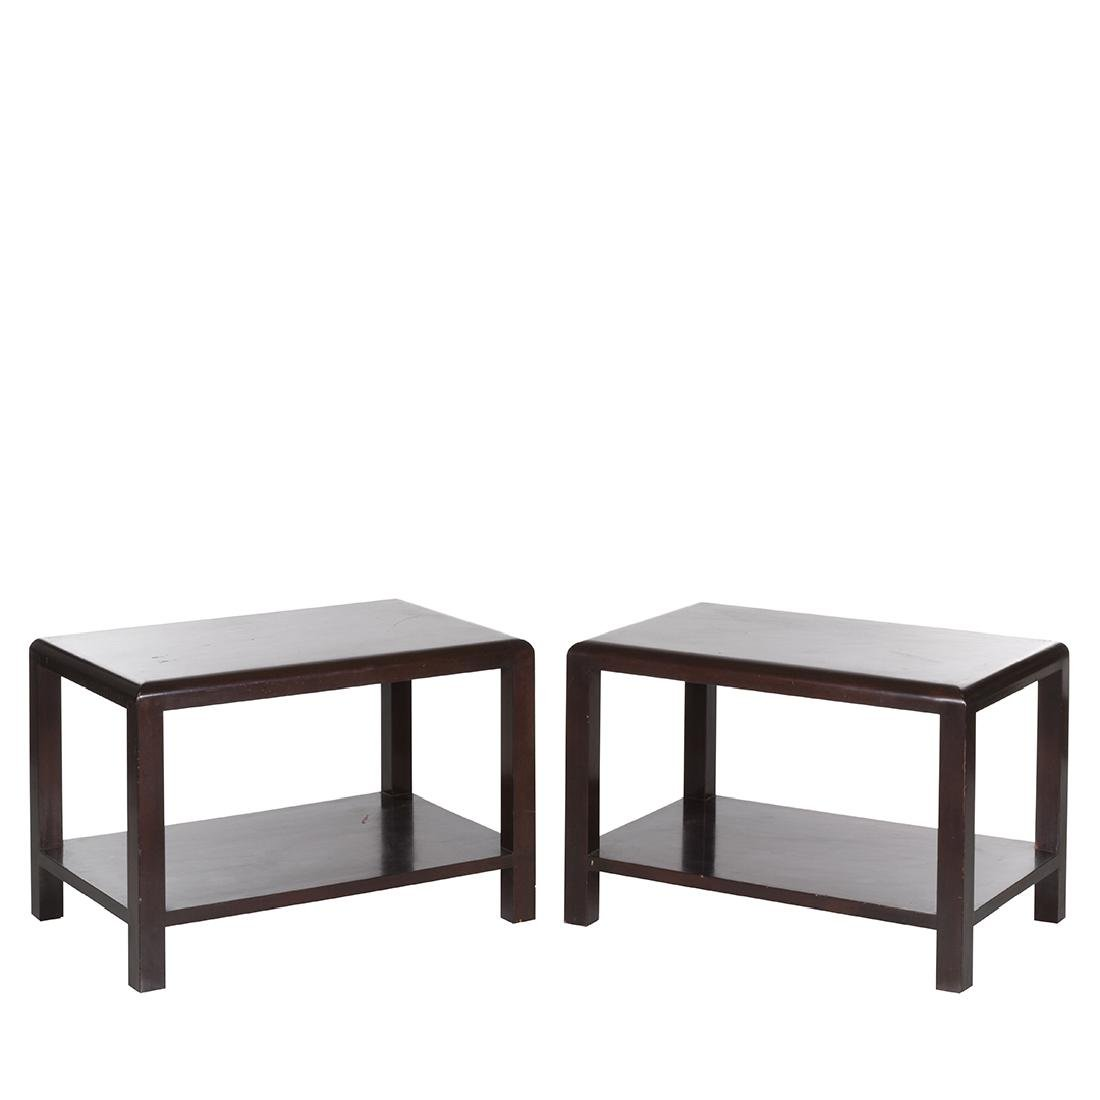 Samuel Marx Side Tables (2)